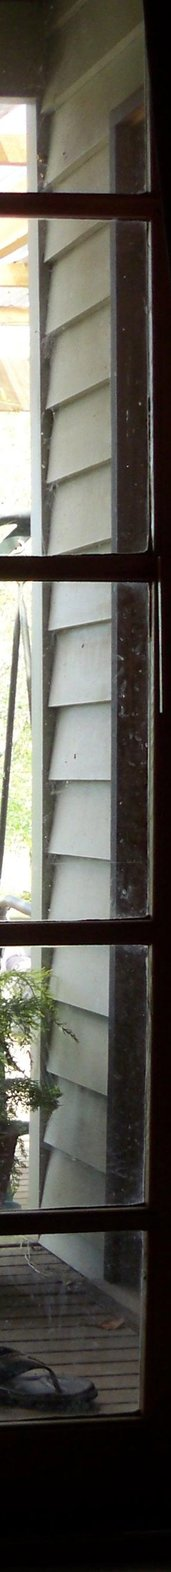 Doorway-Kodak-detail.jpeg